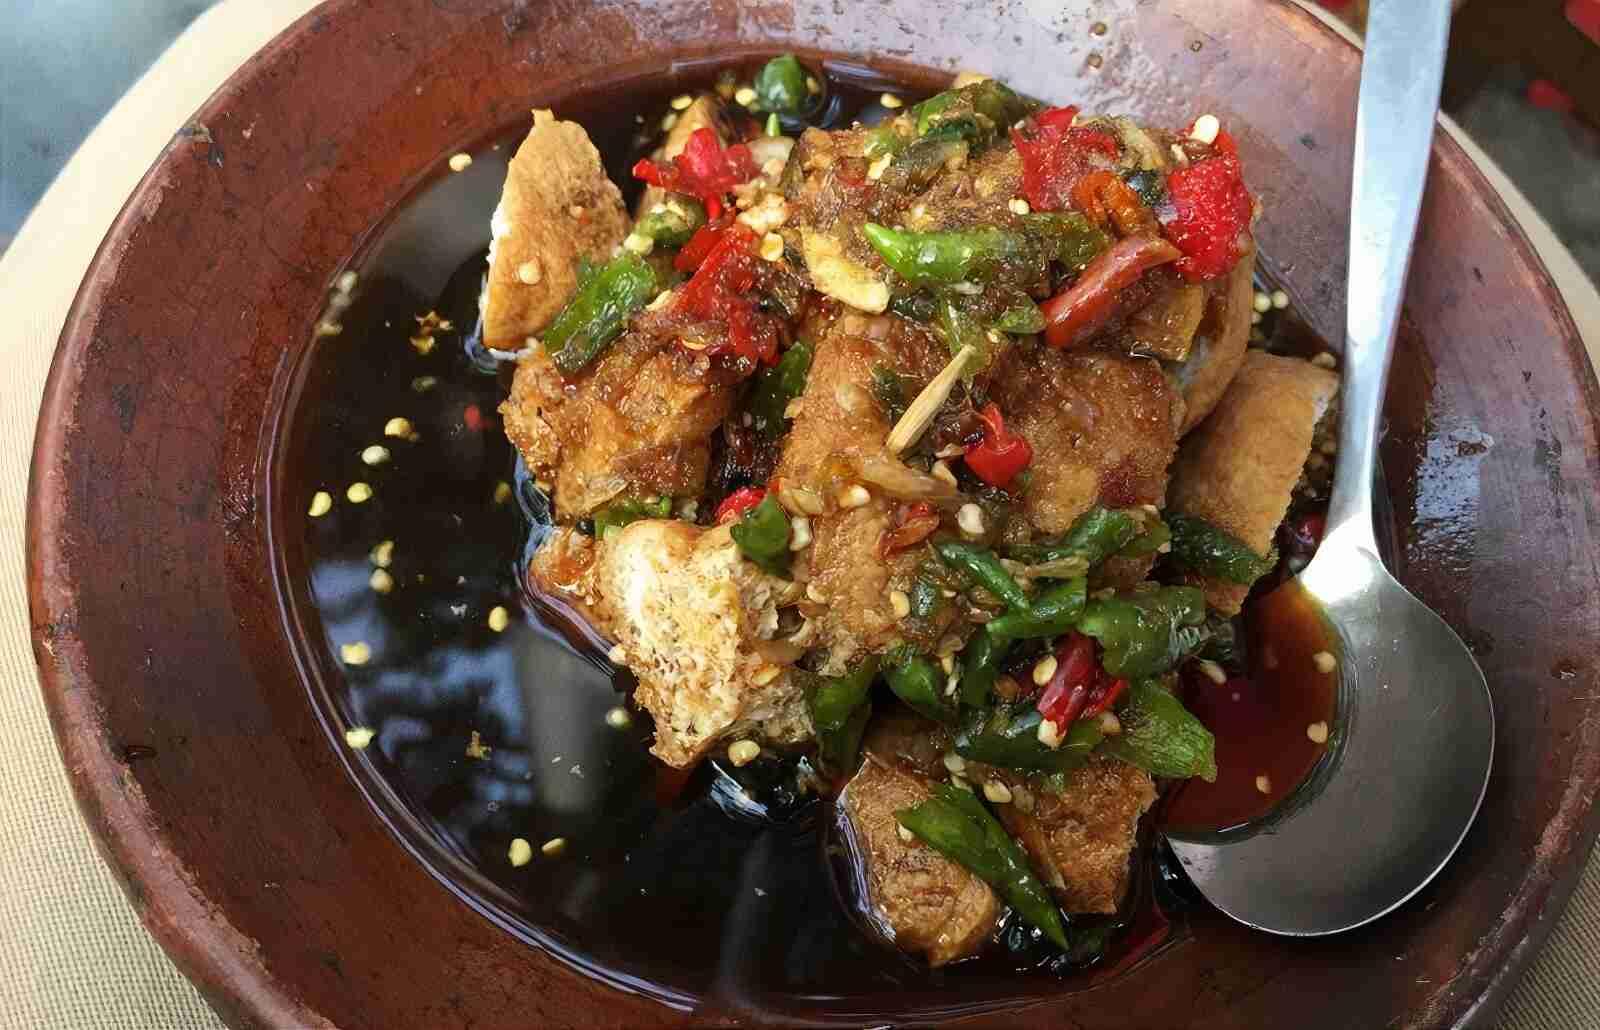 Resep Tahu Gejrot Cirebon Praktis, Pedas dan Nikmat